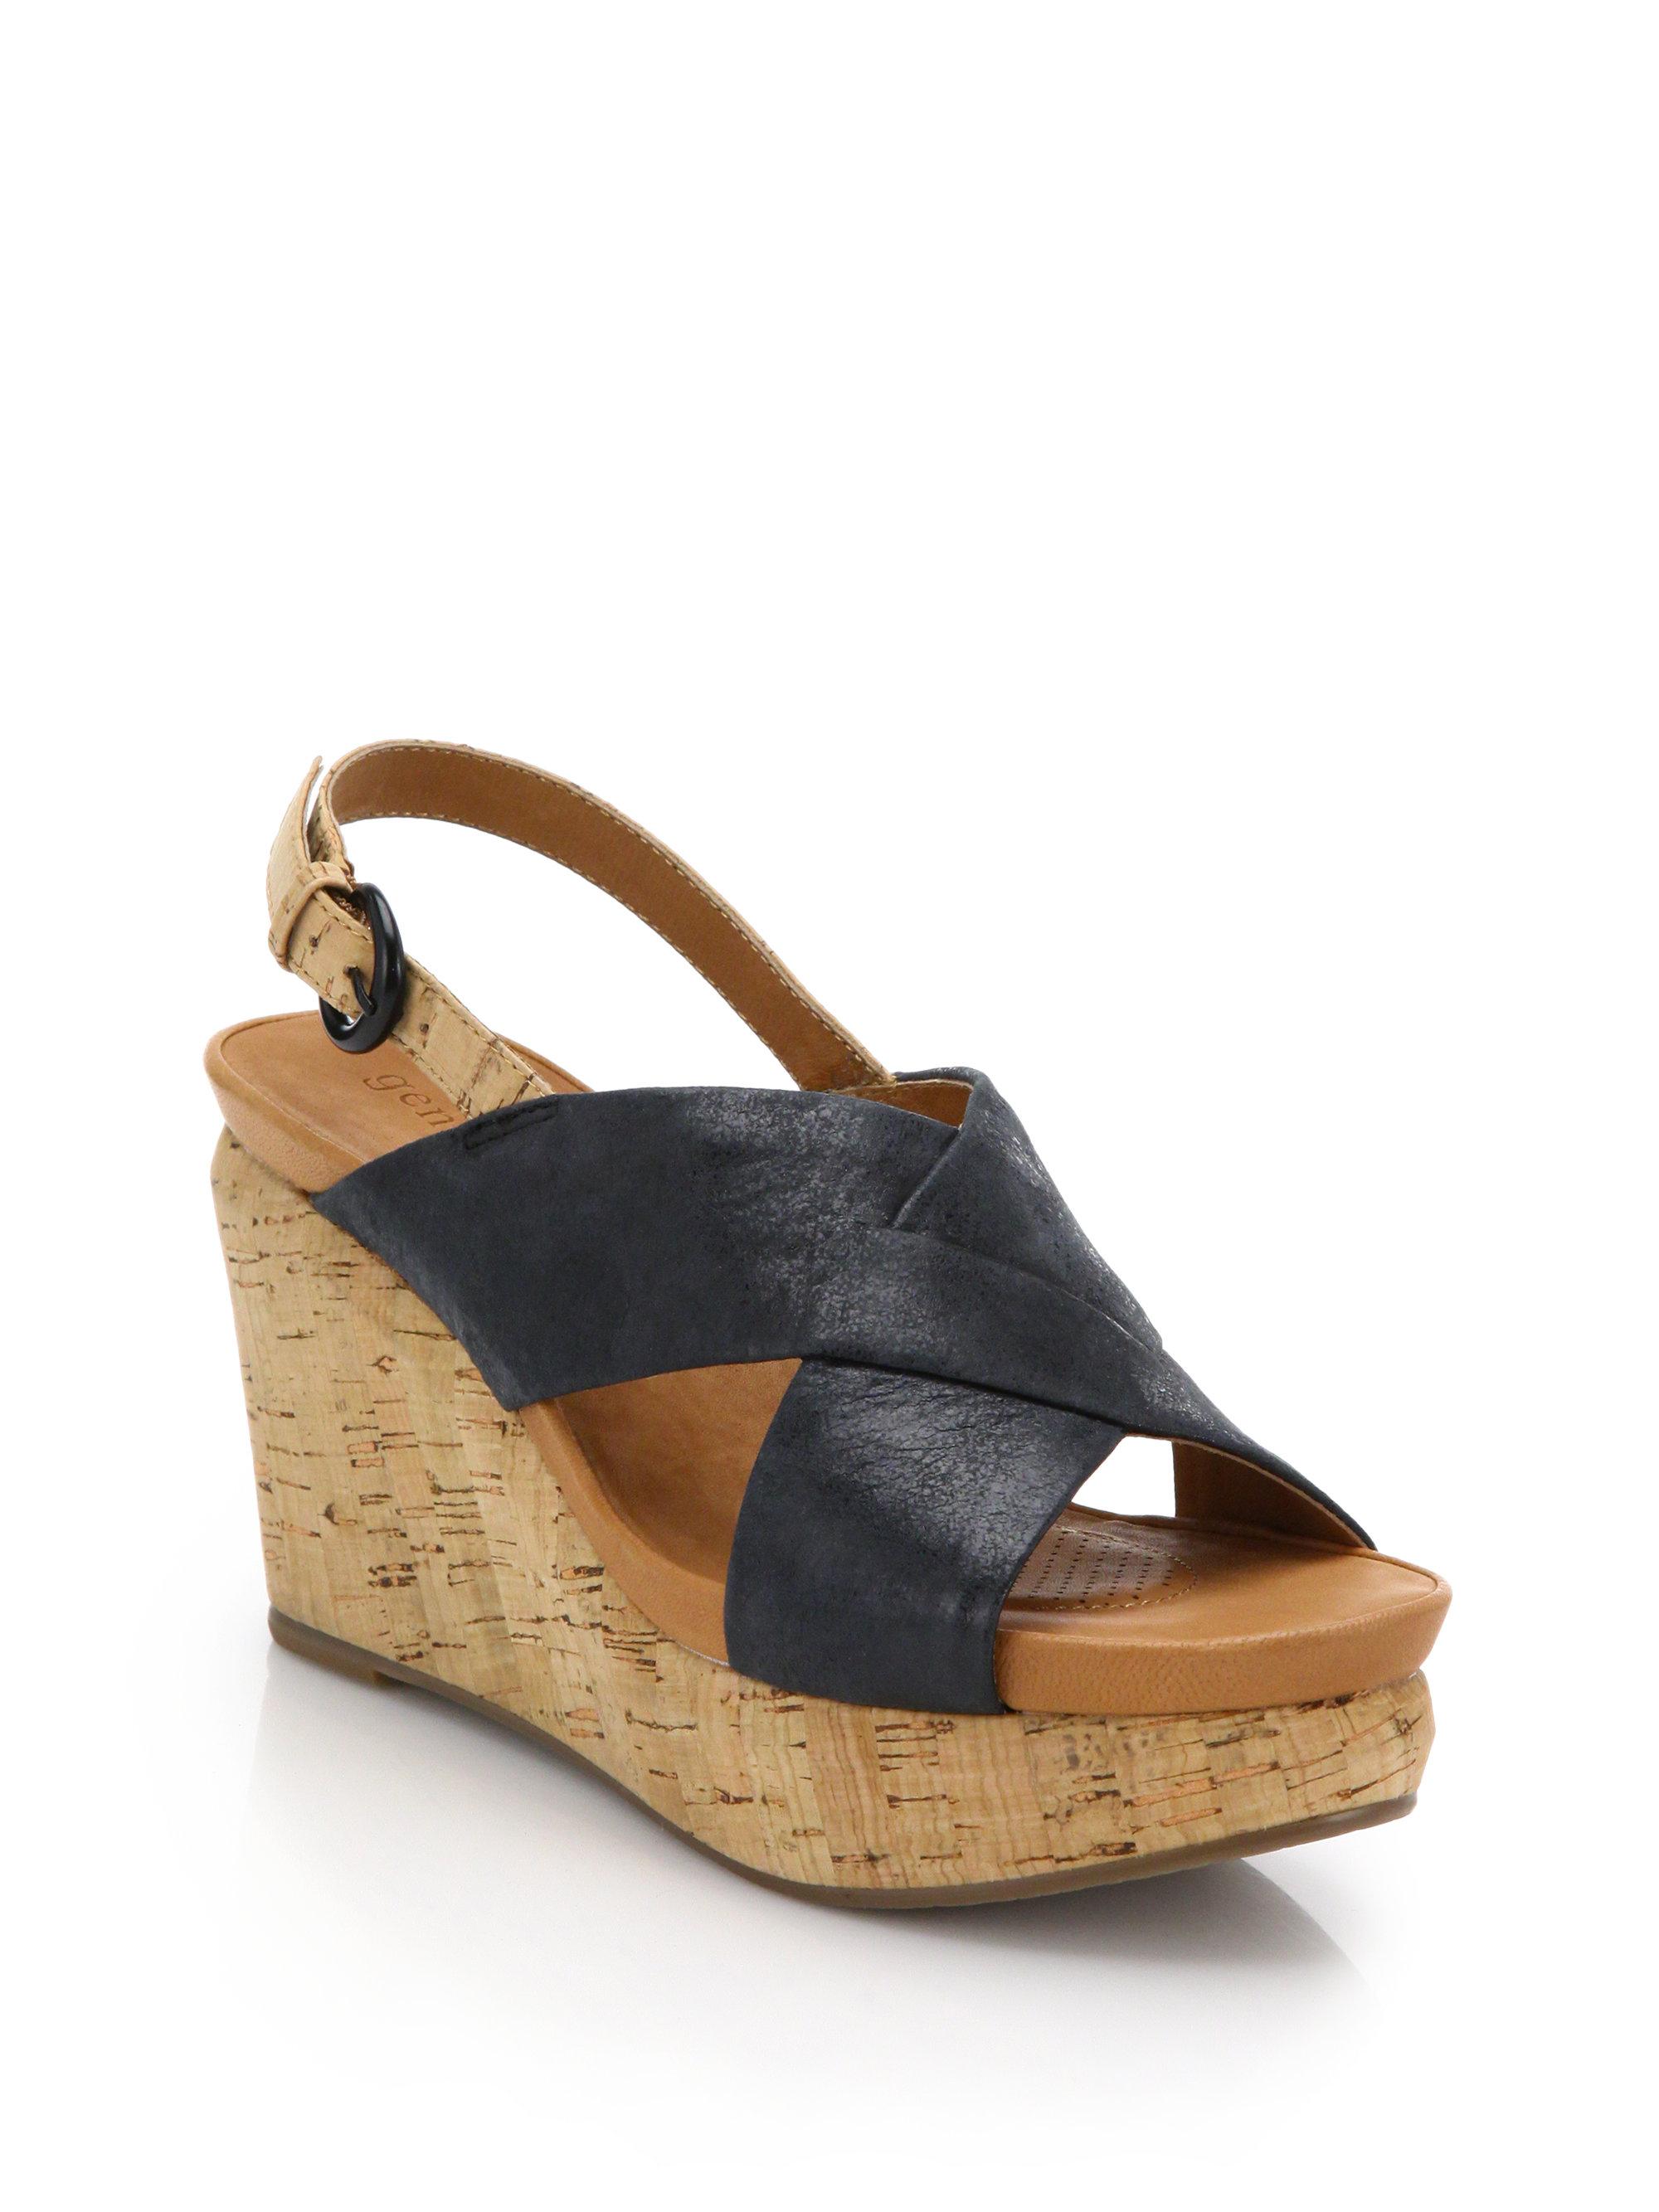 gentle souls leather cork wedge sandals in black lyst